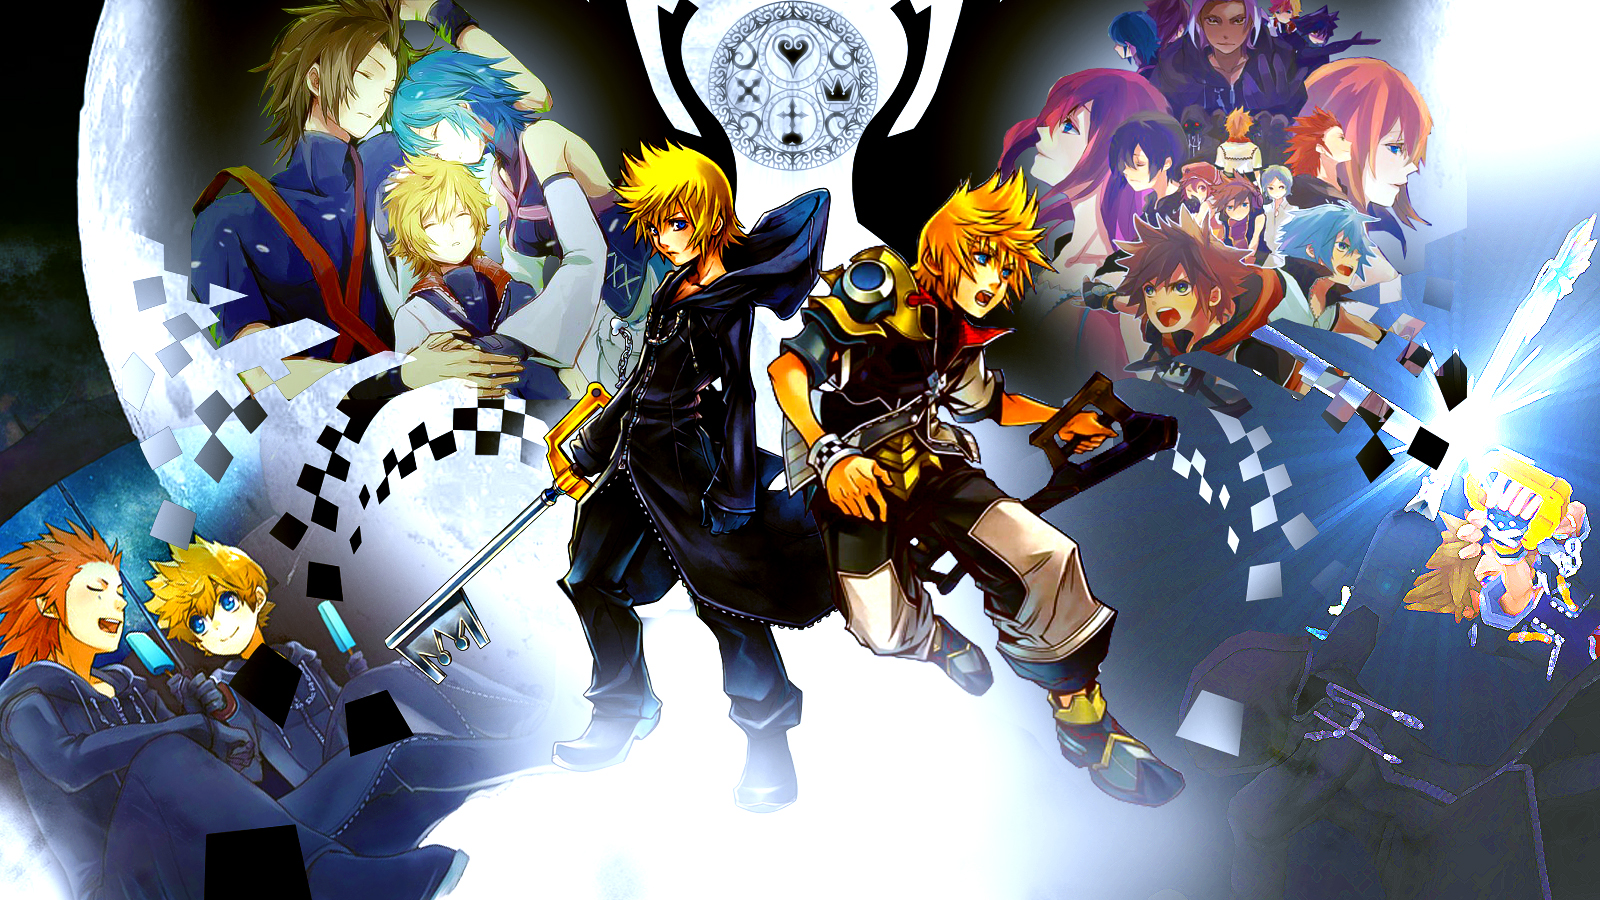 Kingdom Hearts Wallpaper by Sasori640 on DeviantArt